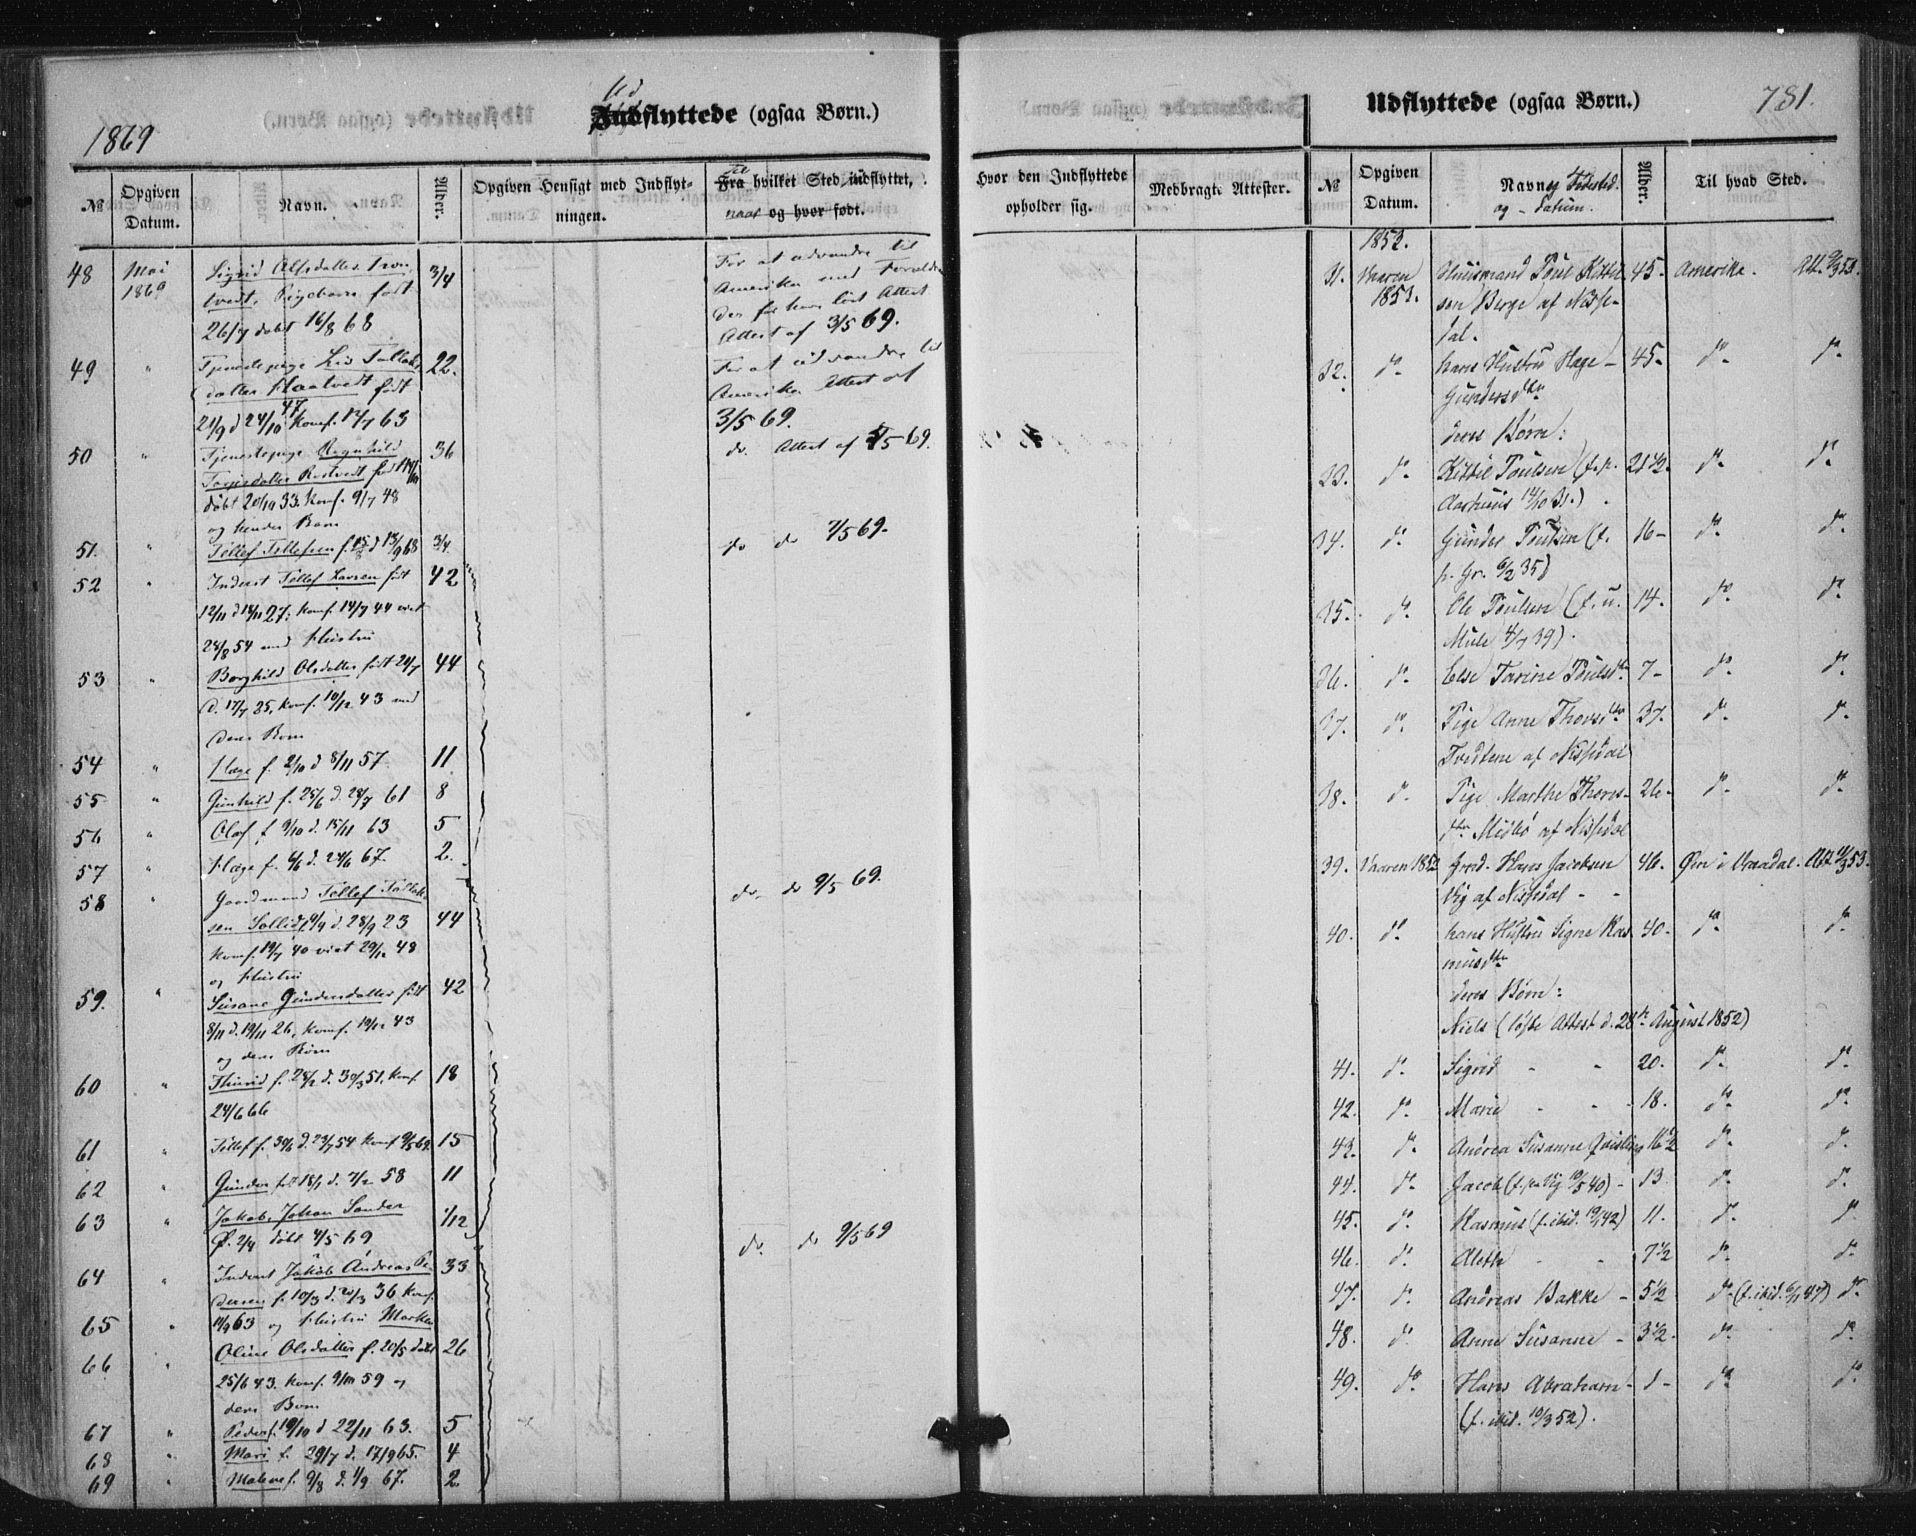 SAKO, Nissedal kirkebøker, F/Fa/L0003: Ministerialbok nr. I 3, 1846-1870, s. 780-781